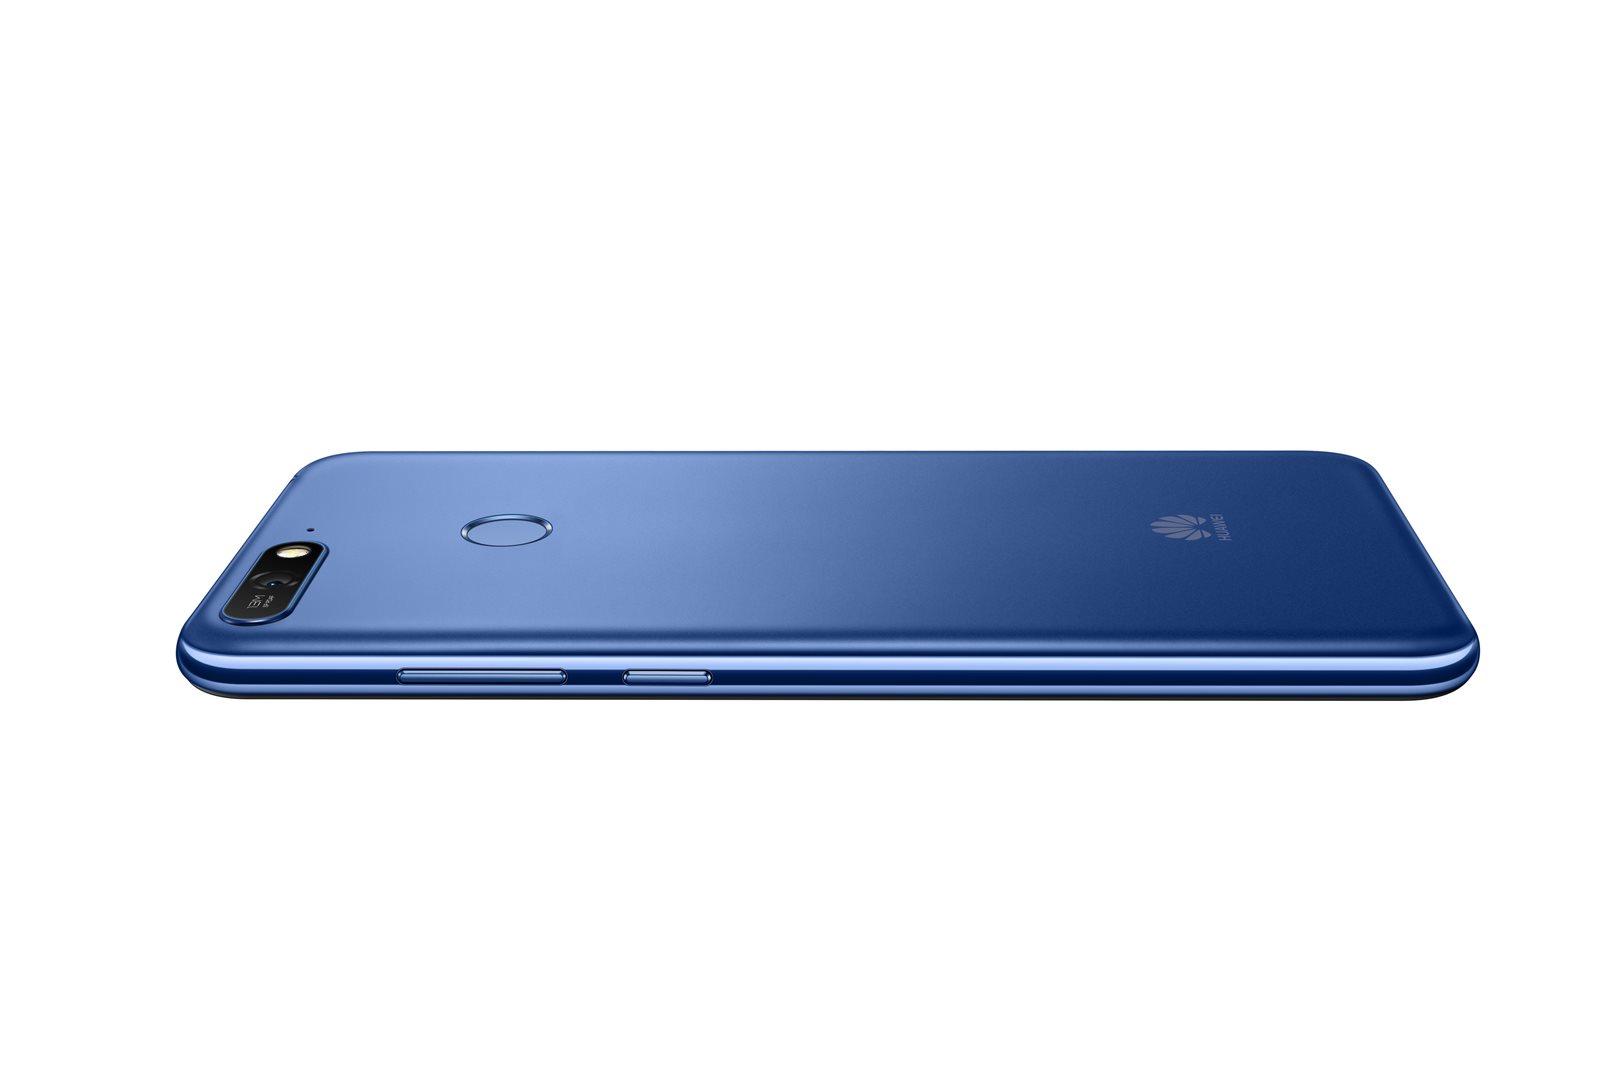 Stylový smartphone Huawei Y6 Prime 2018